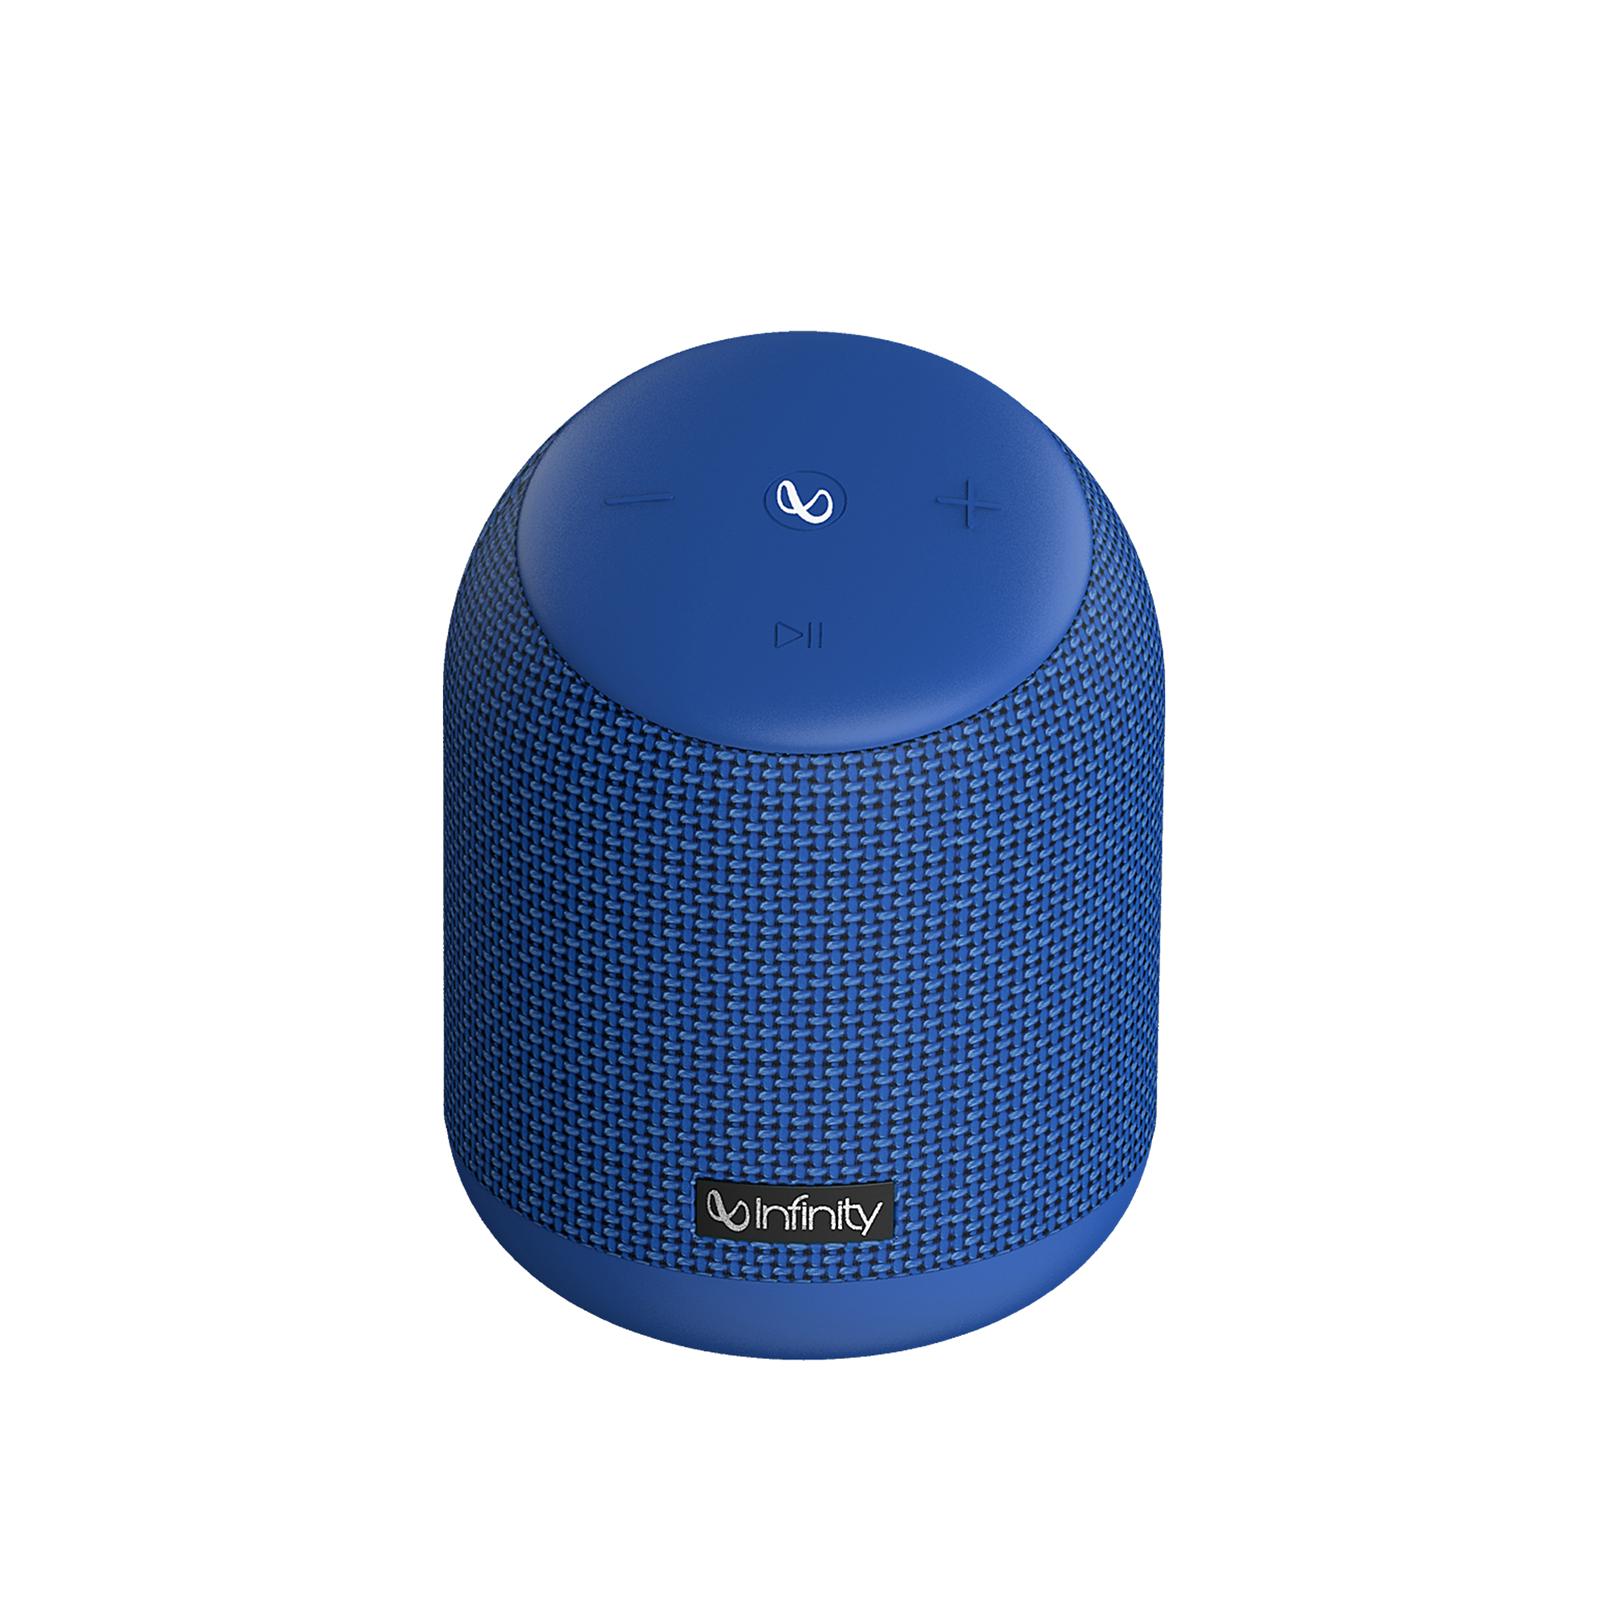 INFINITY FUZE 200 - Blue - Portable Wireless Speakers - Front